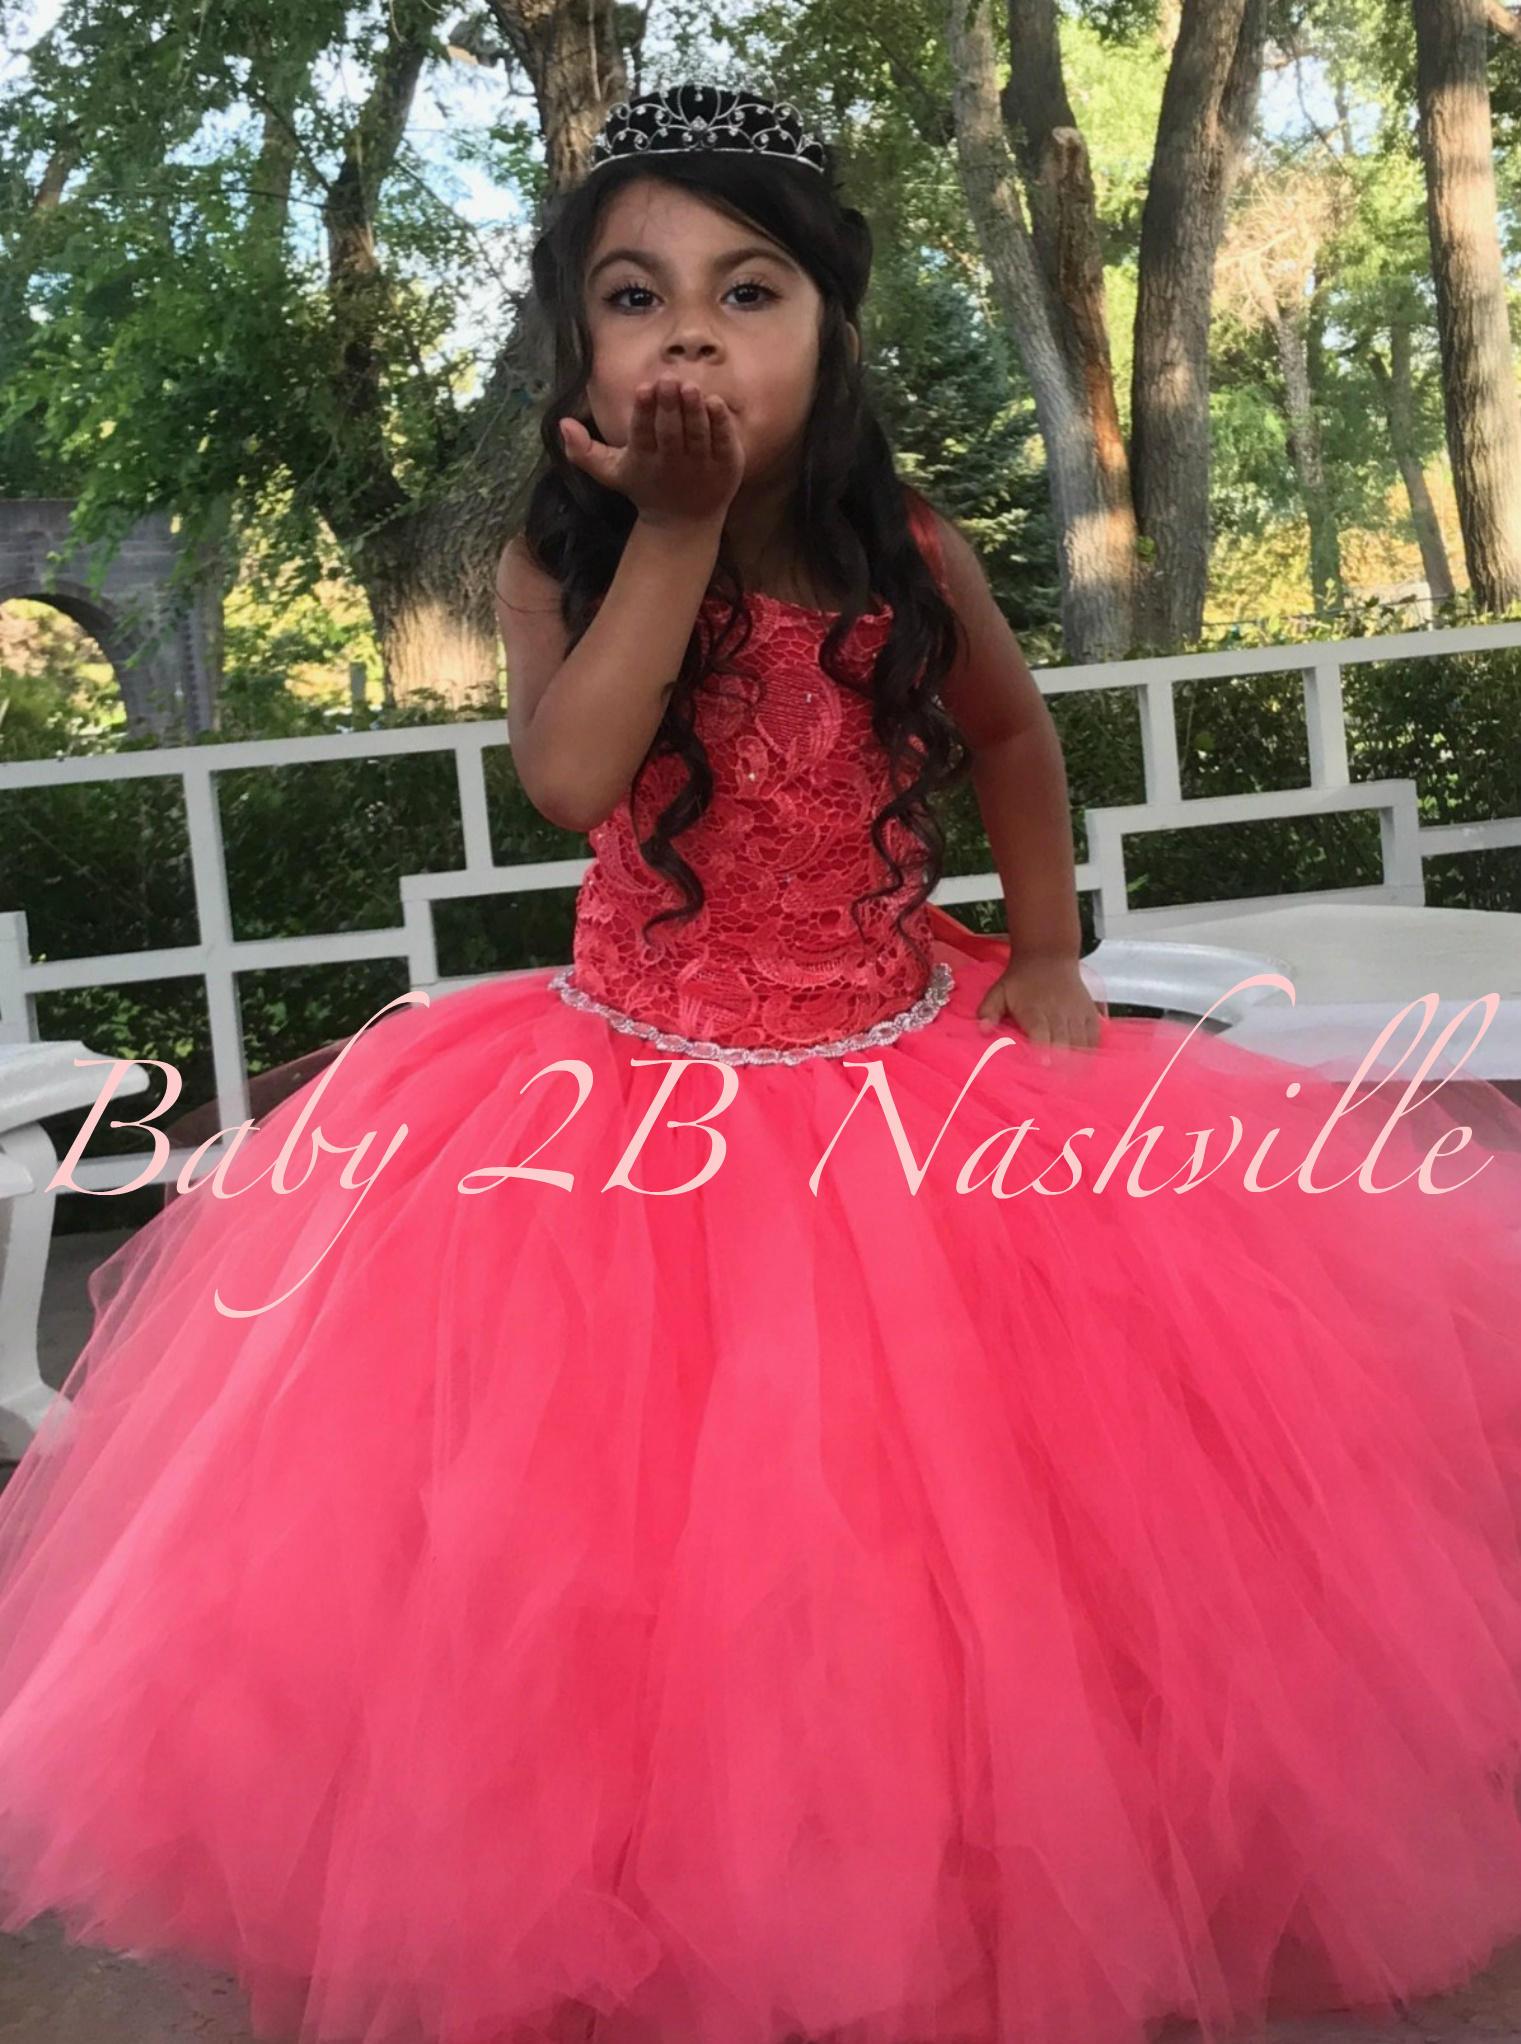 95f7e4406d1 Coral Flower Girl Dress Wedding Dress Coral Dress Coral Lucky ...